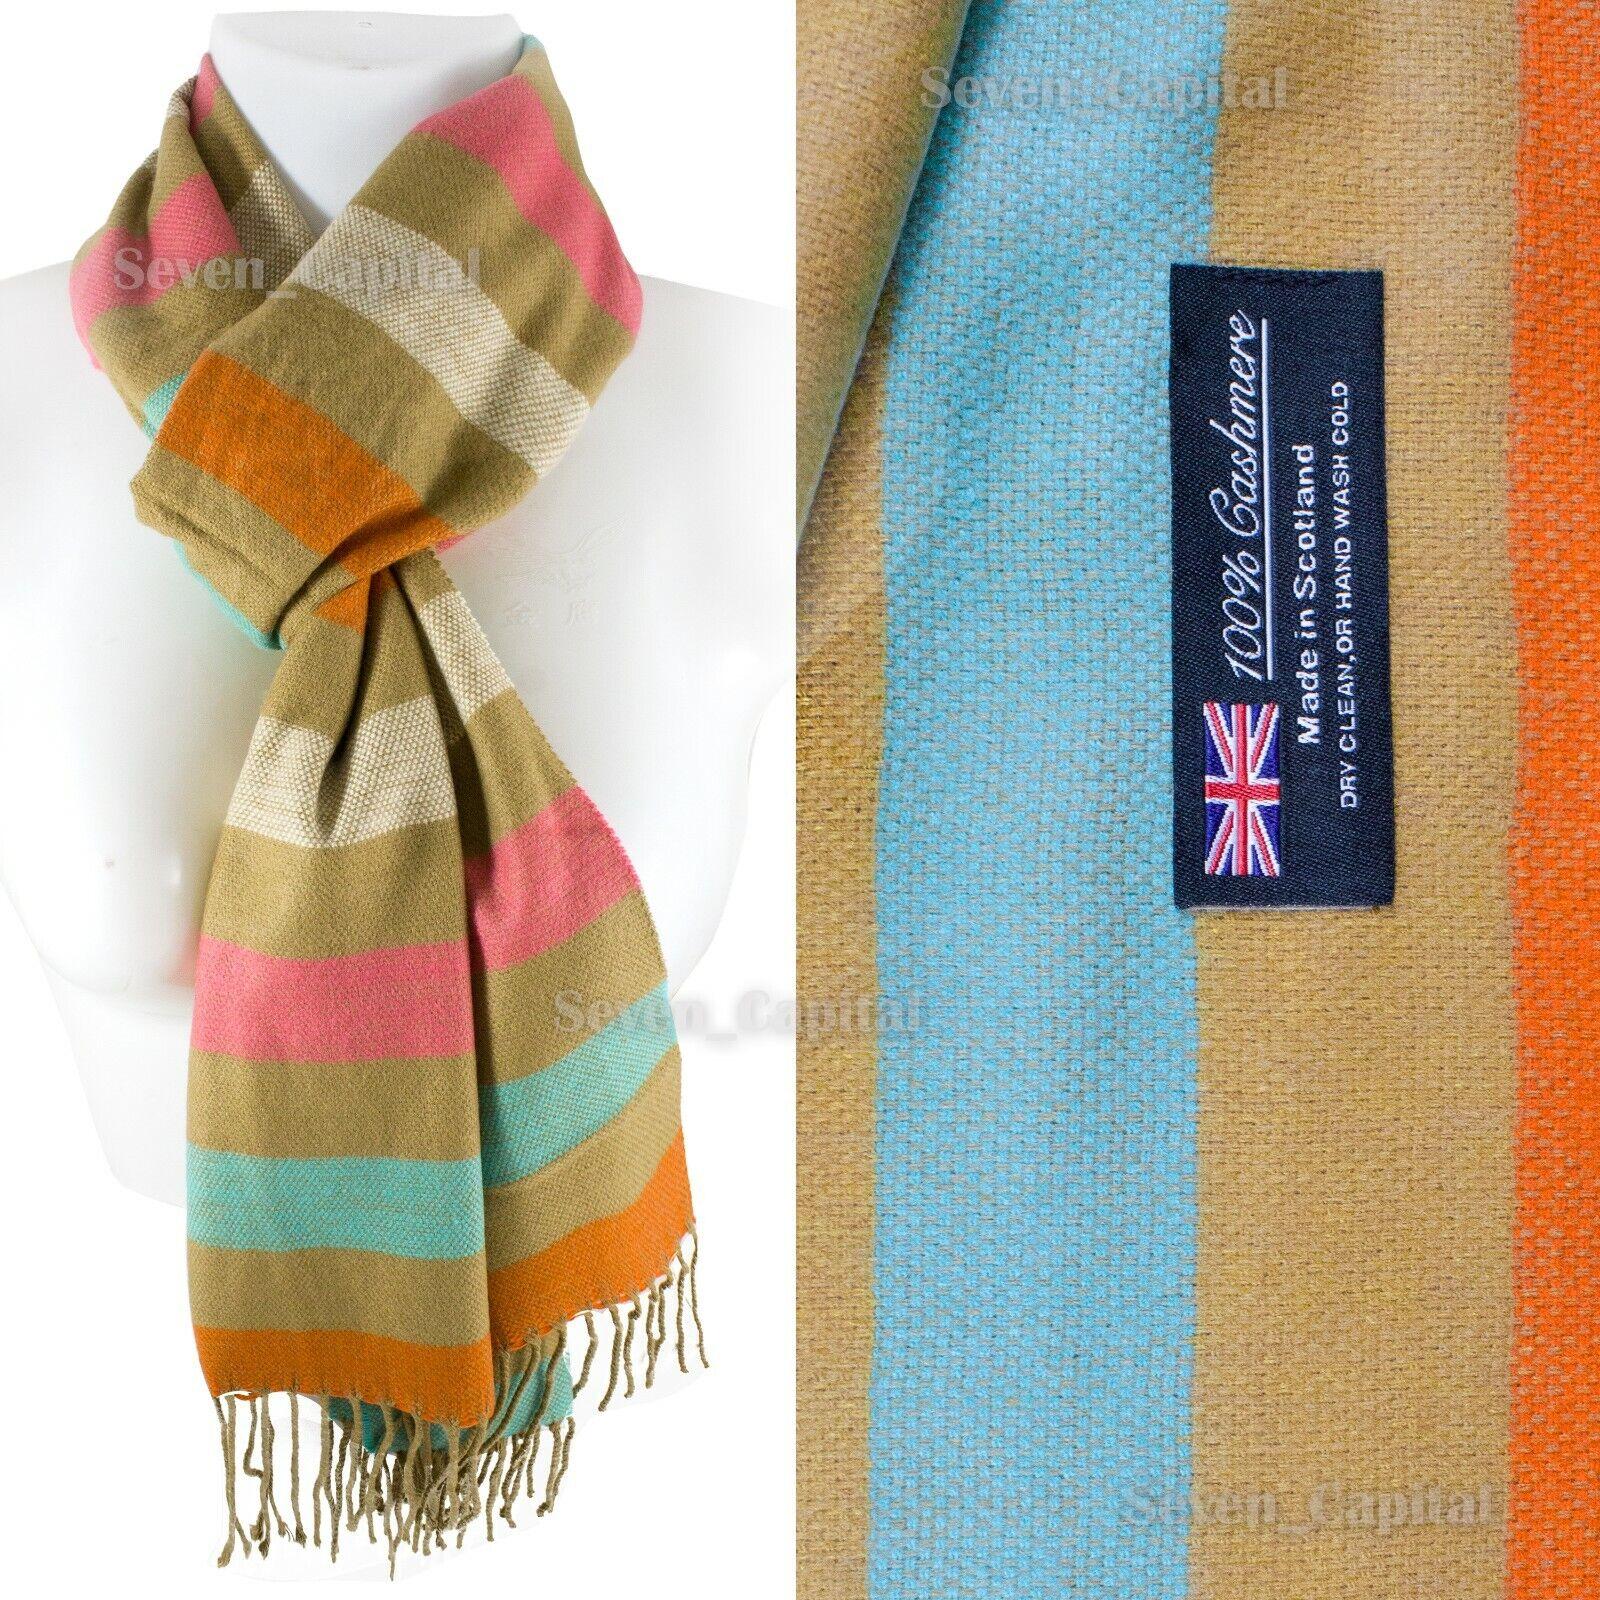 Mens Womens Winter Warm SCOTLAND Made 100% CASHMERE Scarf Scarves Plaid Wool 26. Plaid: Beige Strip